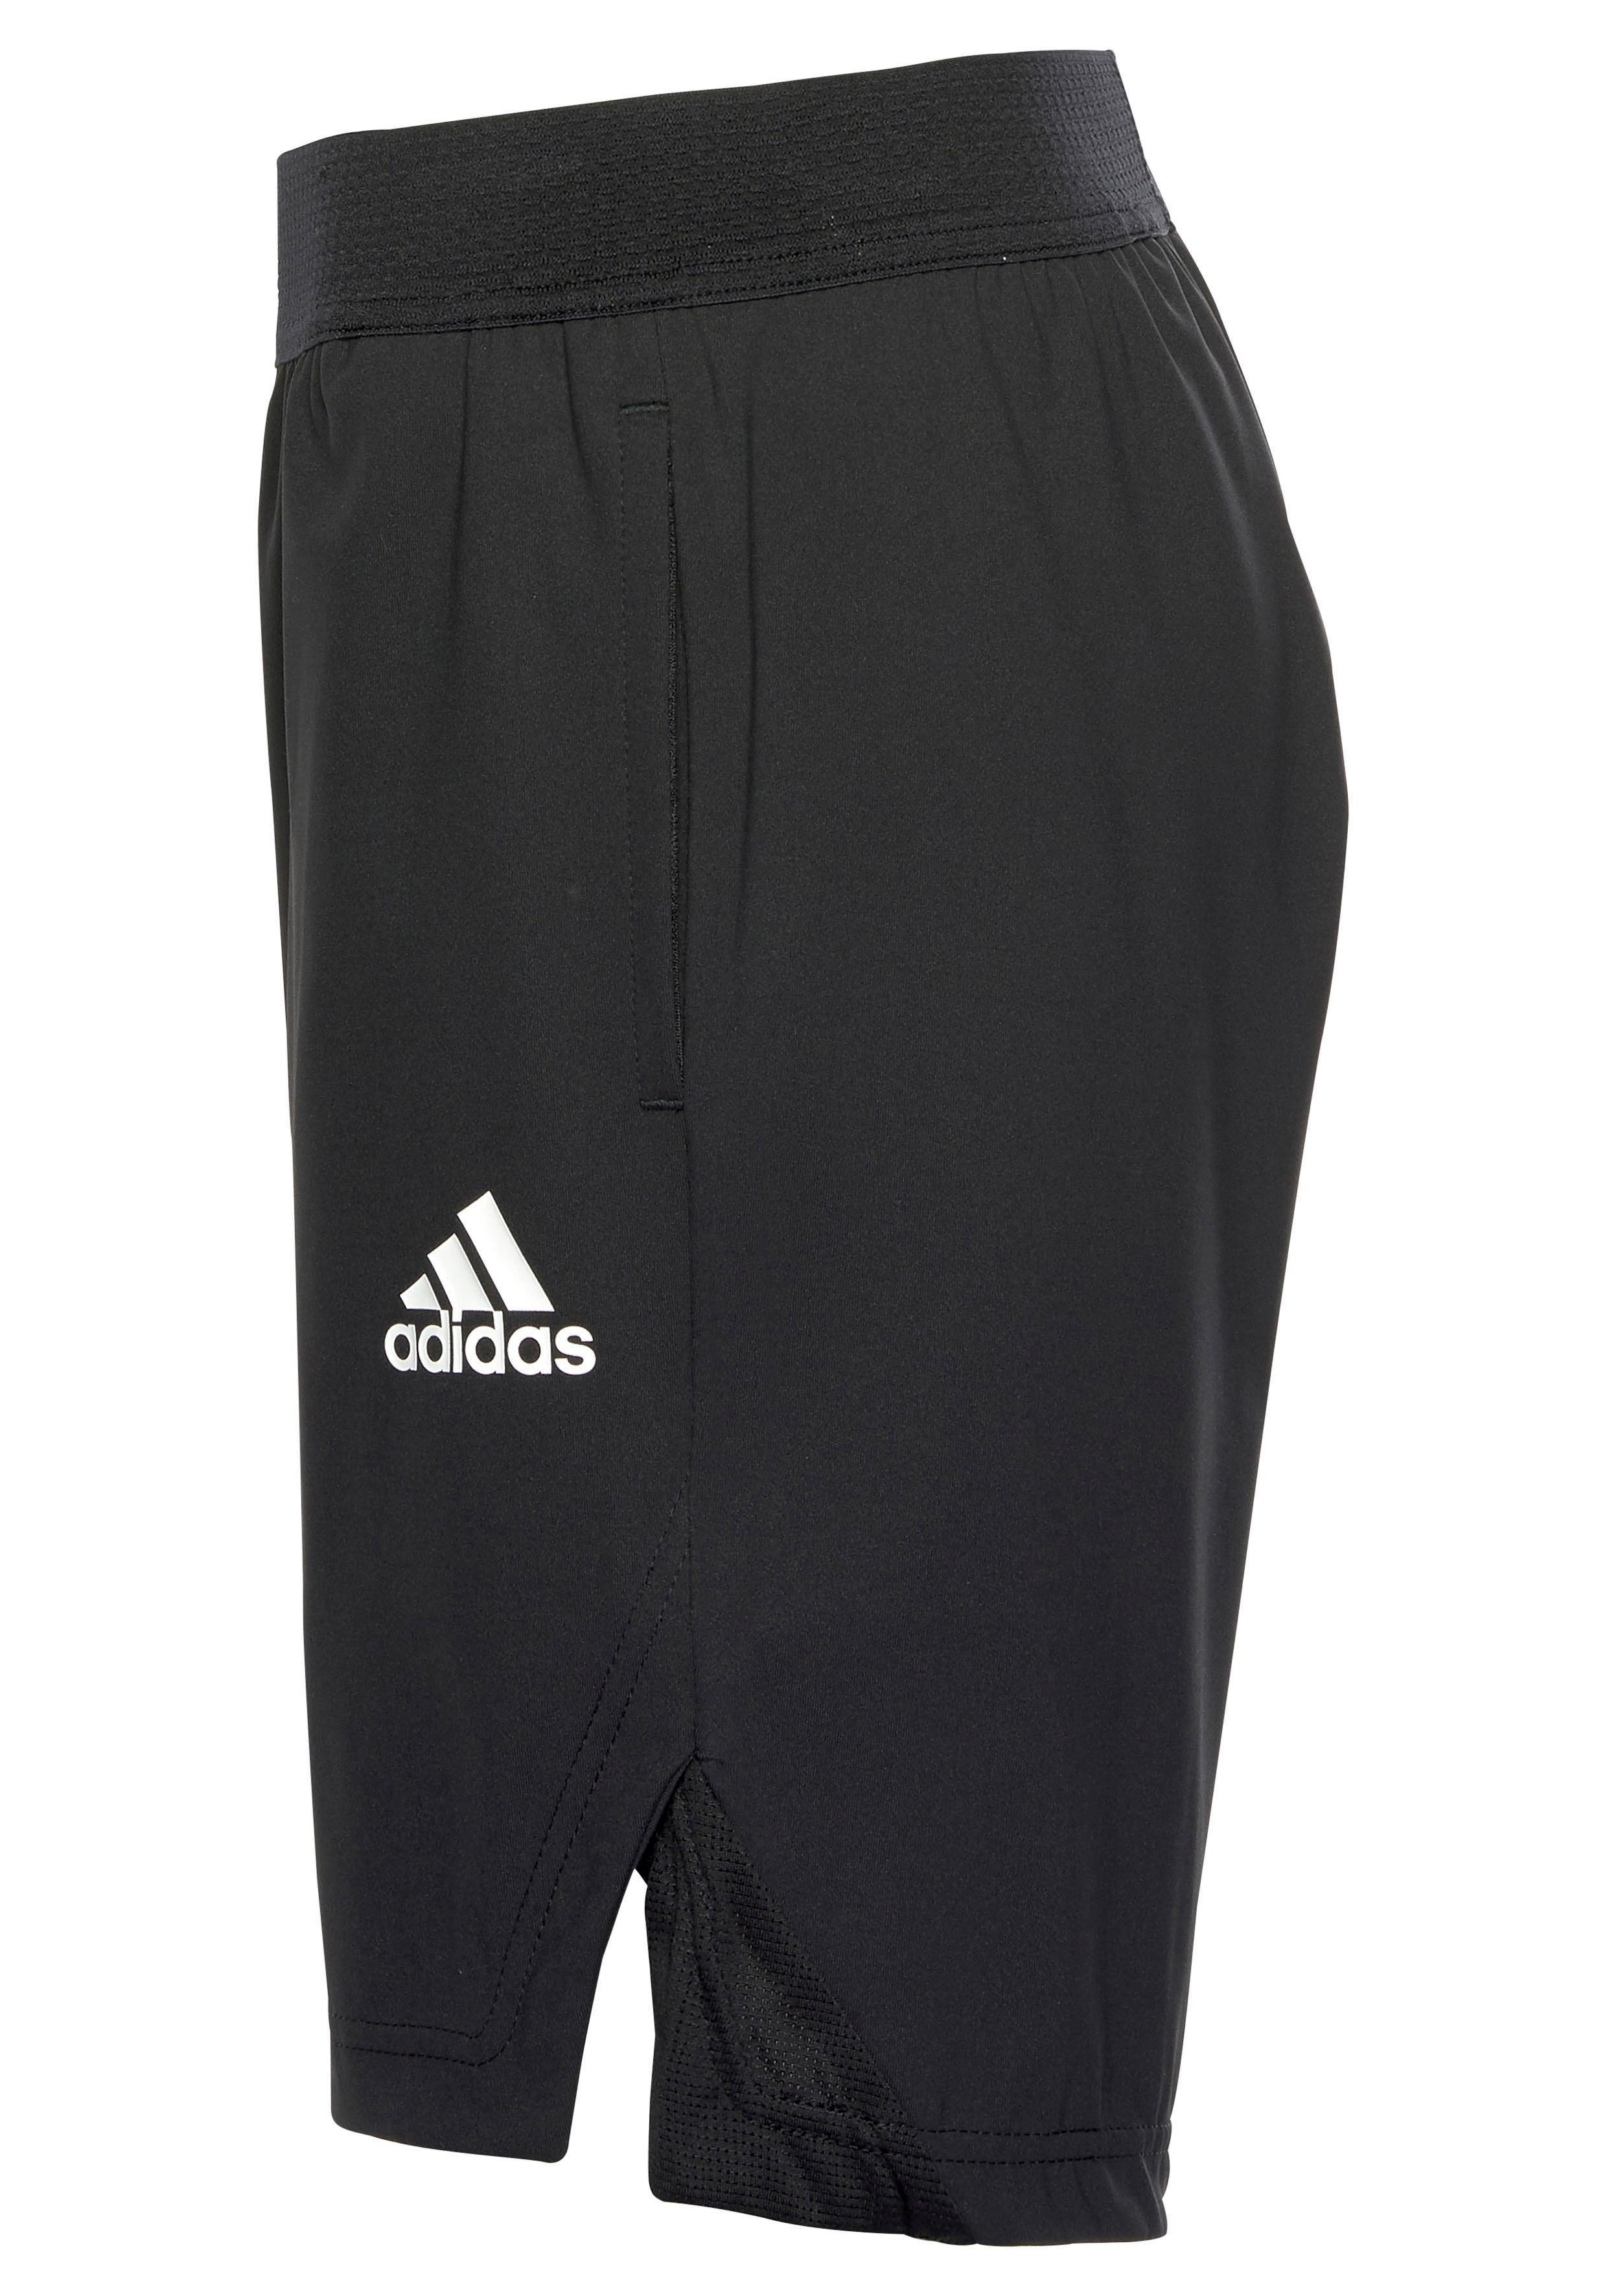 adidas Performance short »BOYS SHORT« bij OTTO online kopen